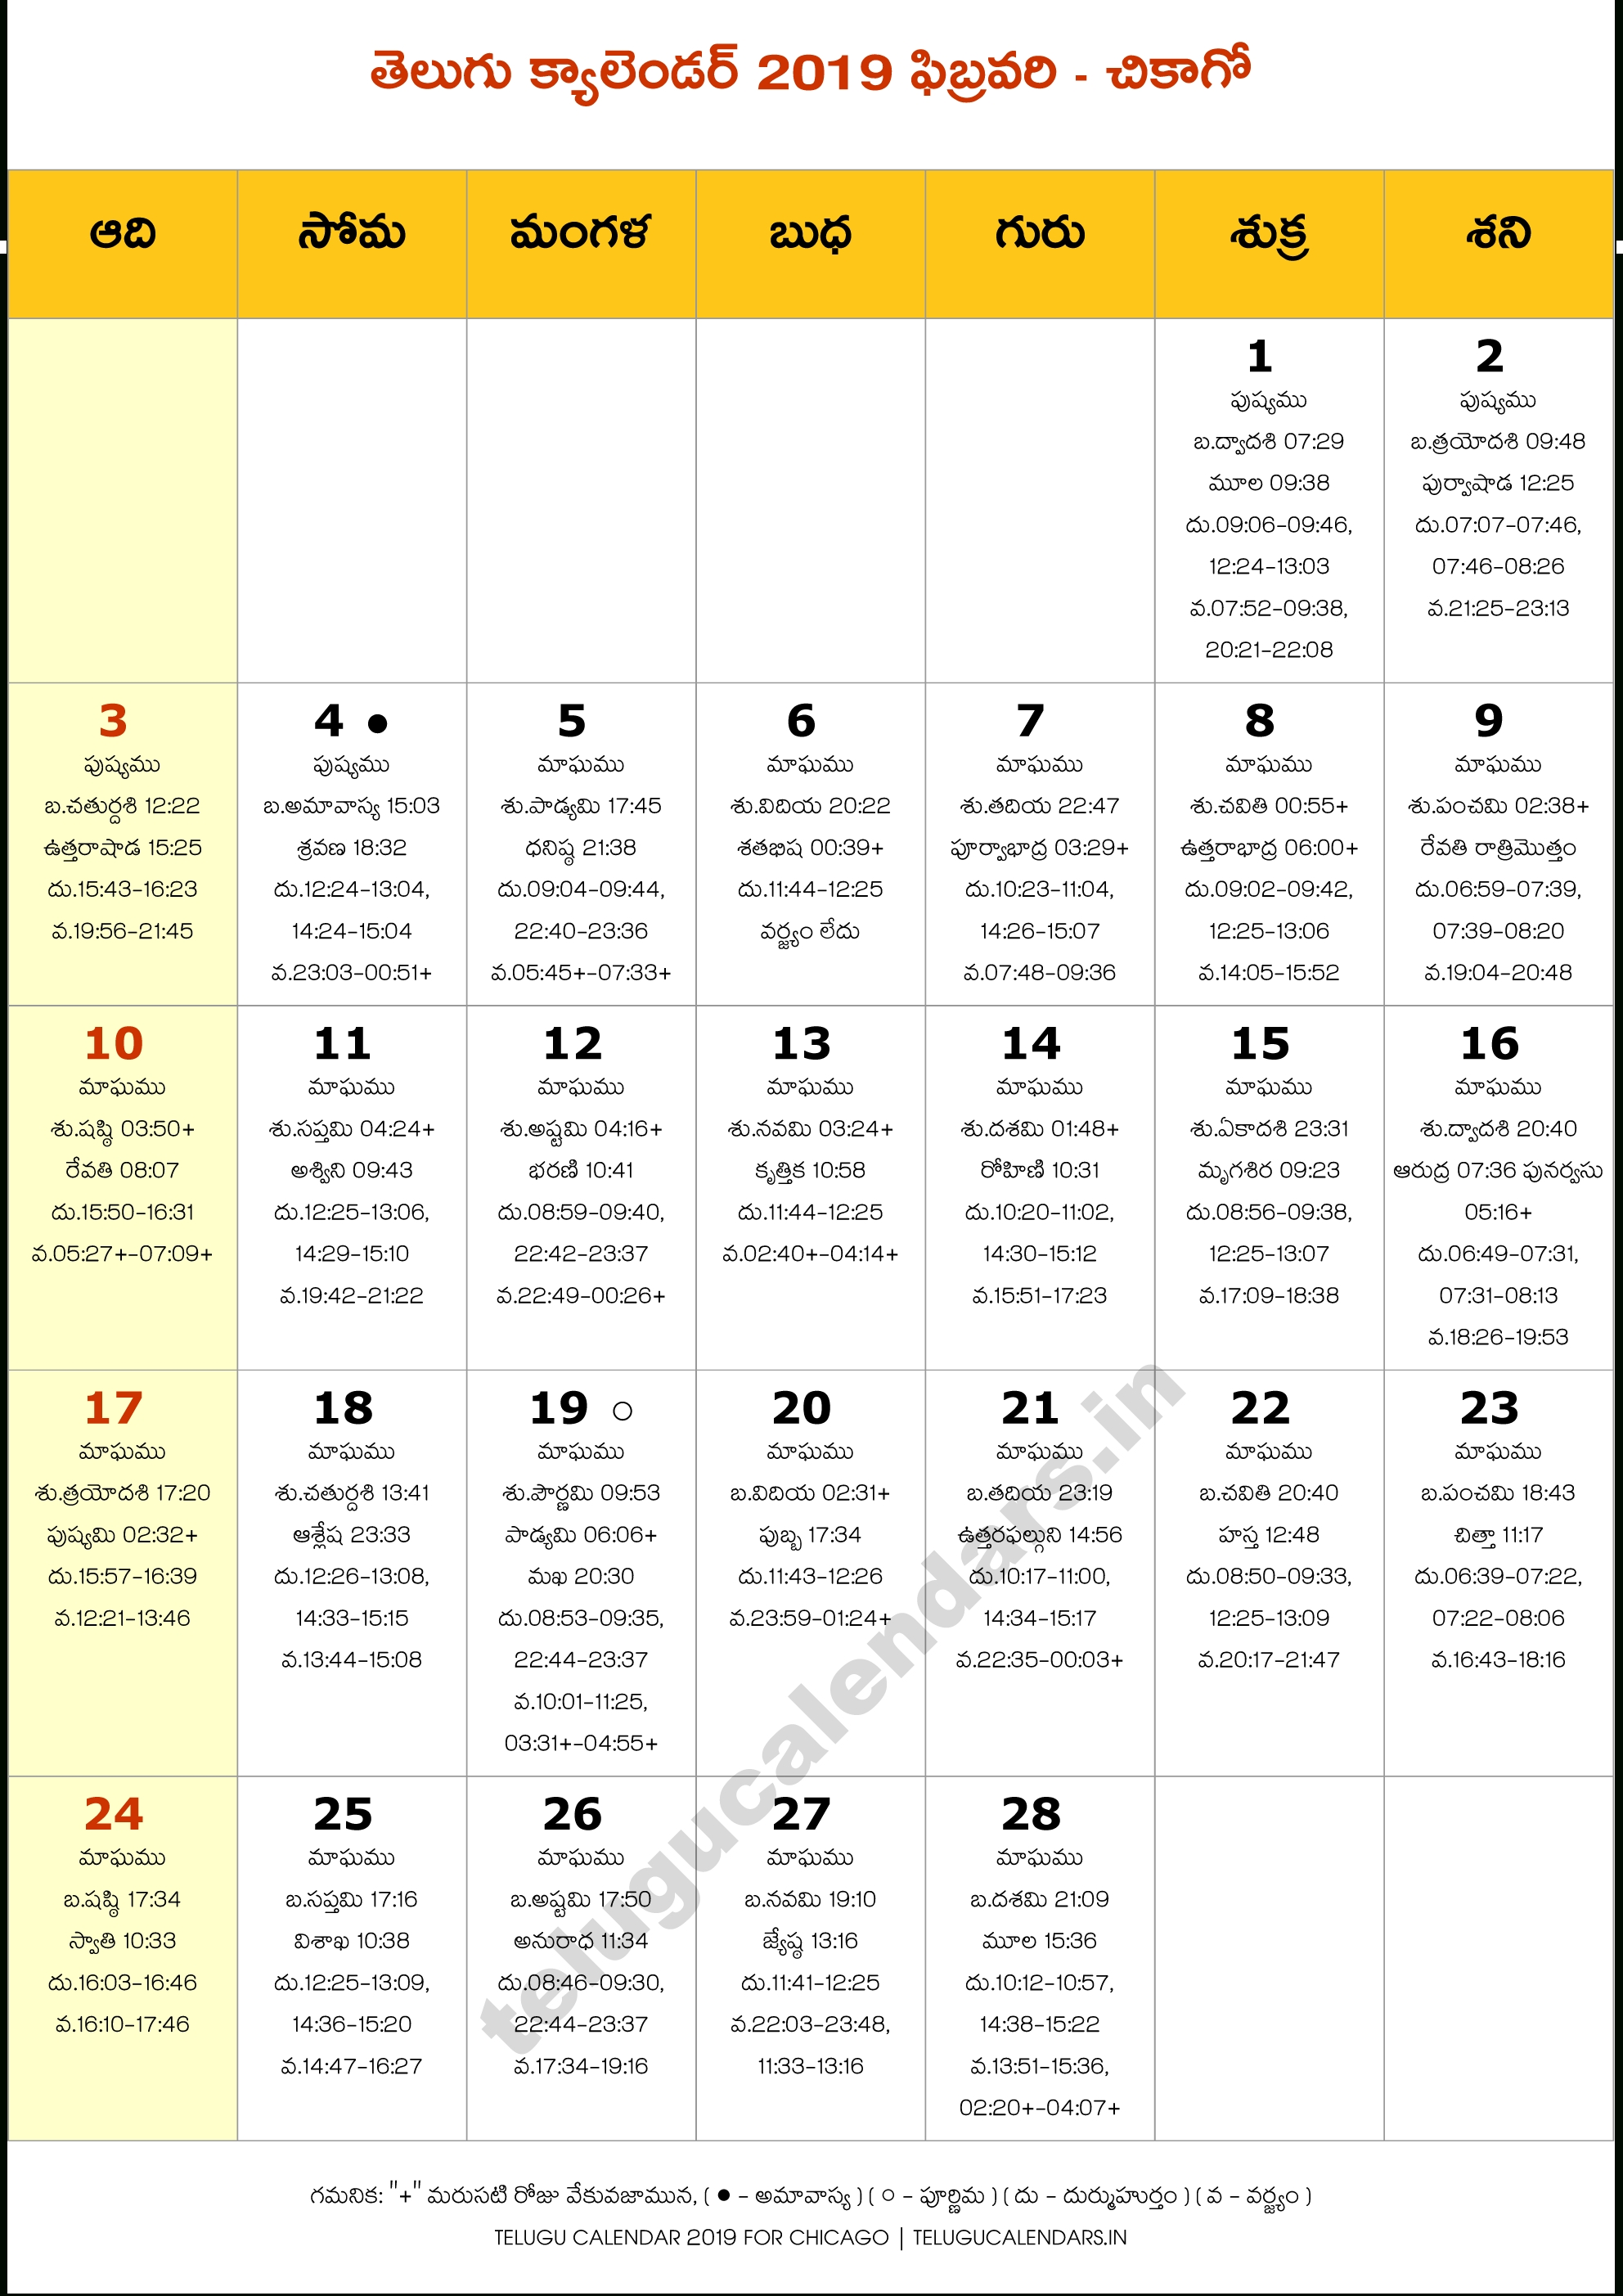 Chicago 2019 February Telugu Calendar | Telugu Calendars Calendar 2019 Telugu